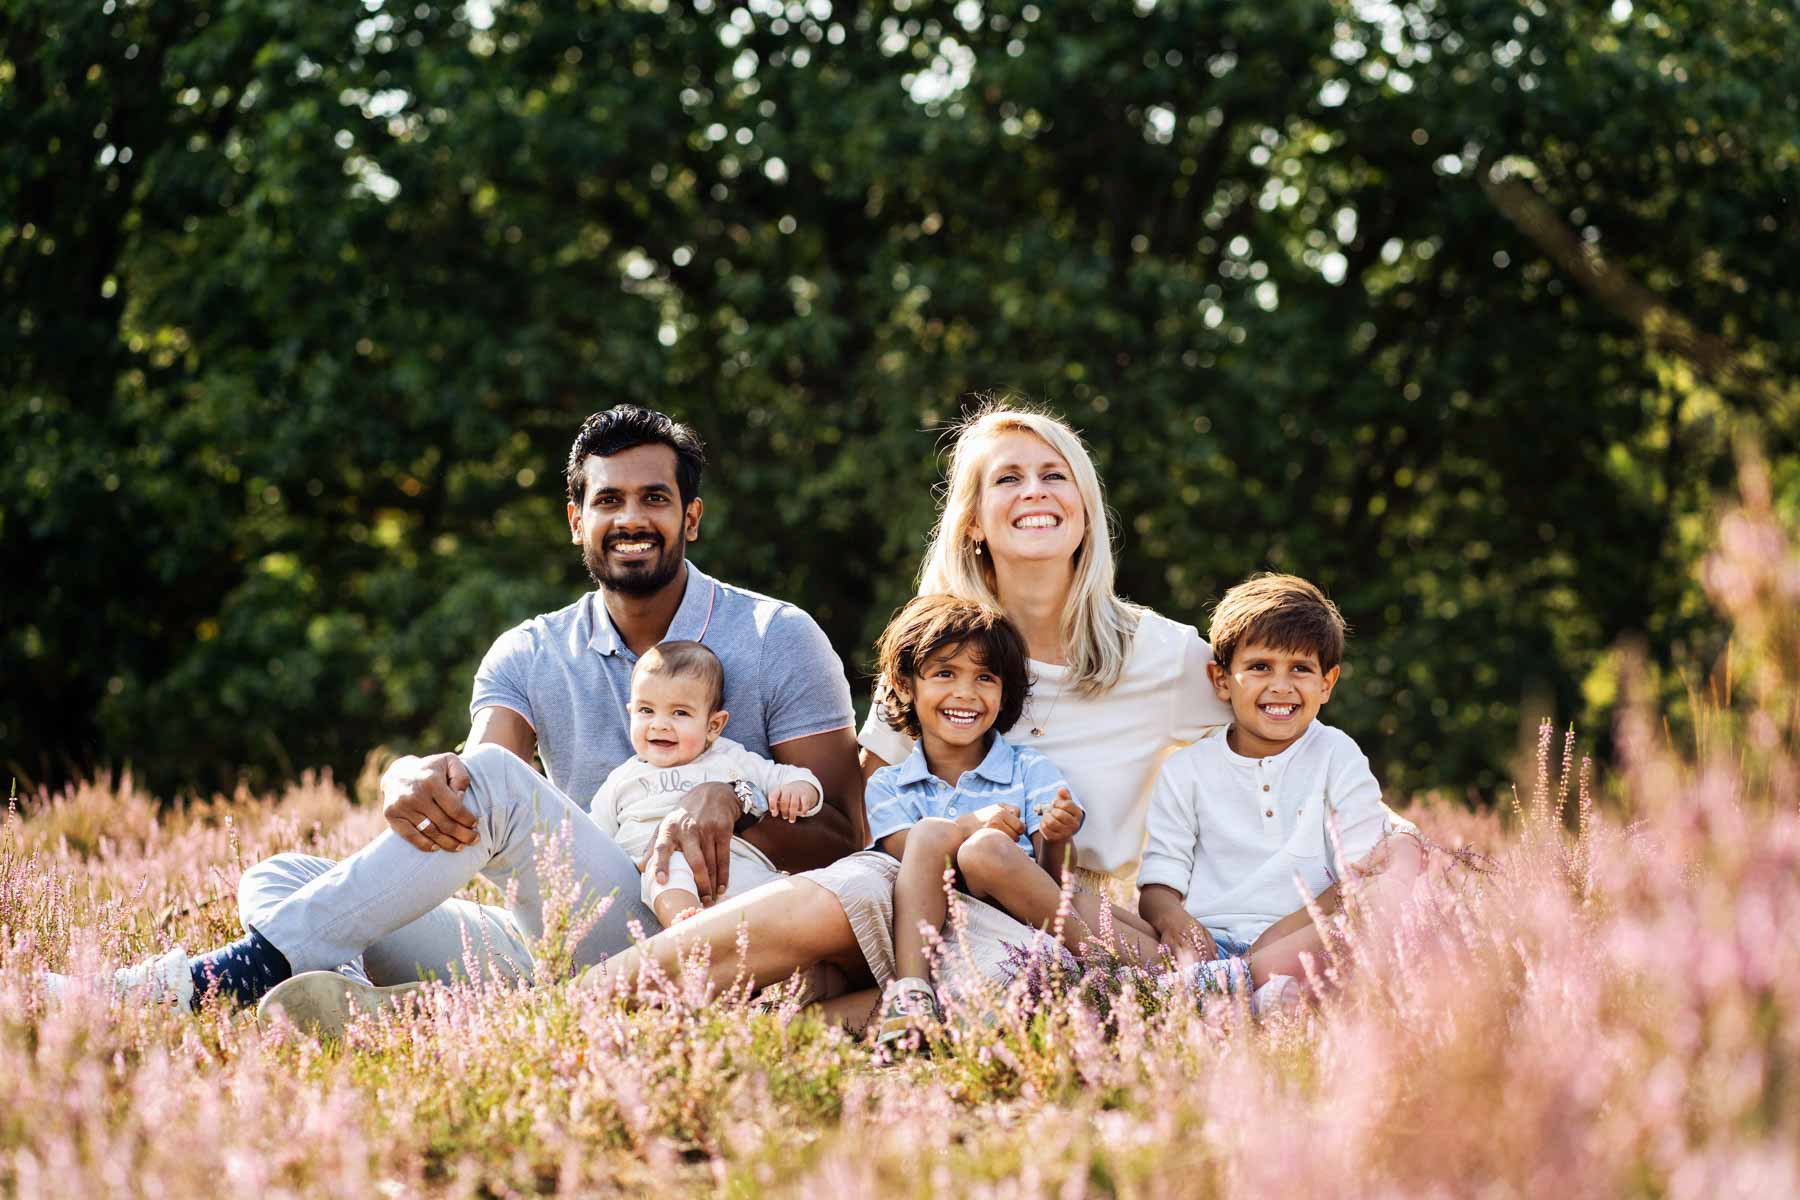 Familieshoot Roermond, familie fotoshoot, familie fotografie Limburg, familiefoto's, fotoshoot familie, gezinsshoot, fotoshoot gezin, fotoshoot kinderen